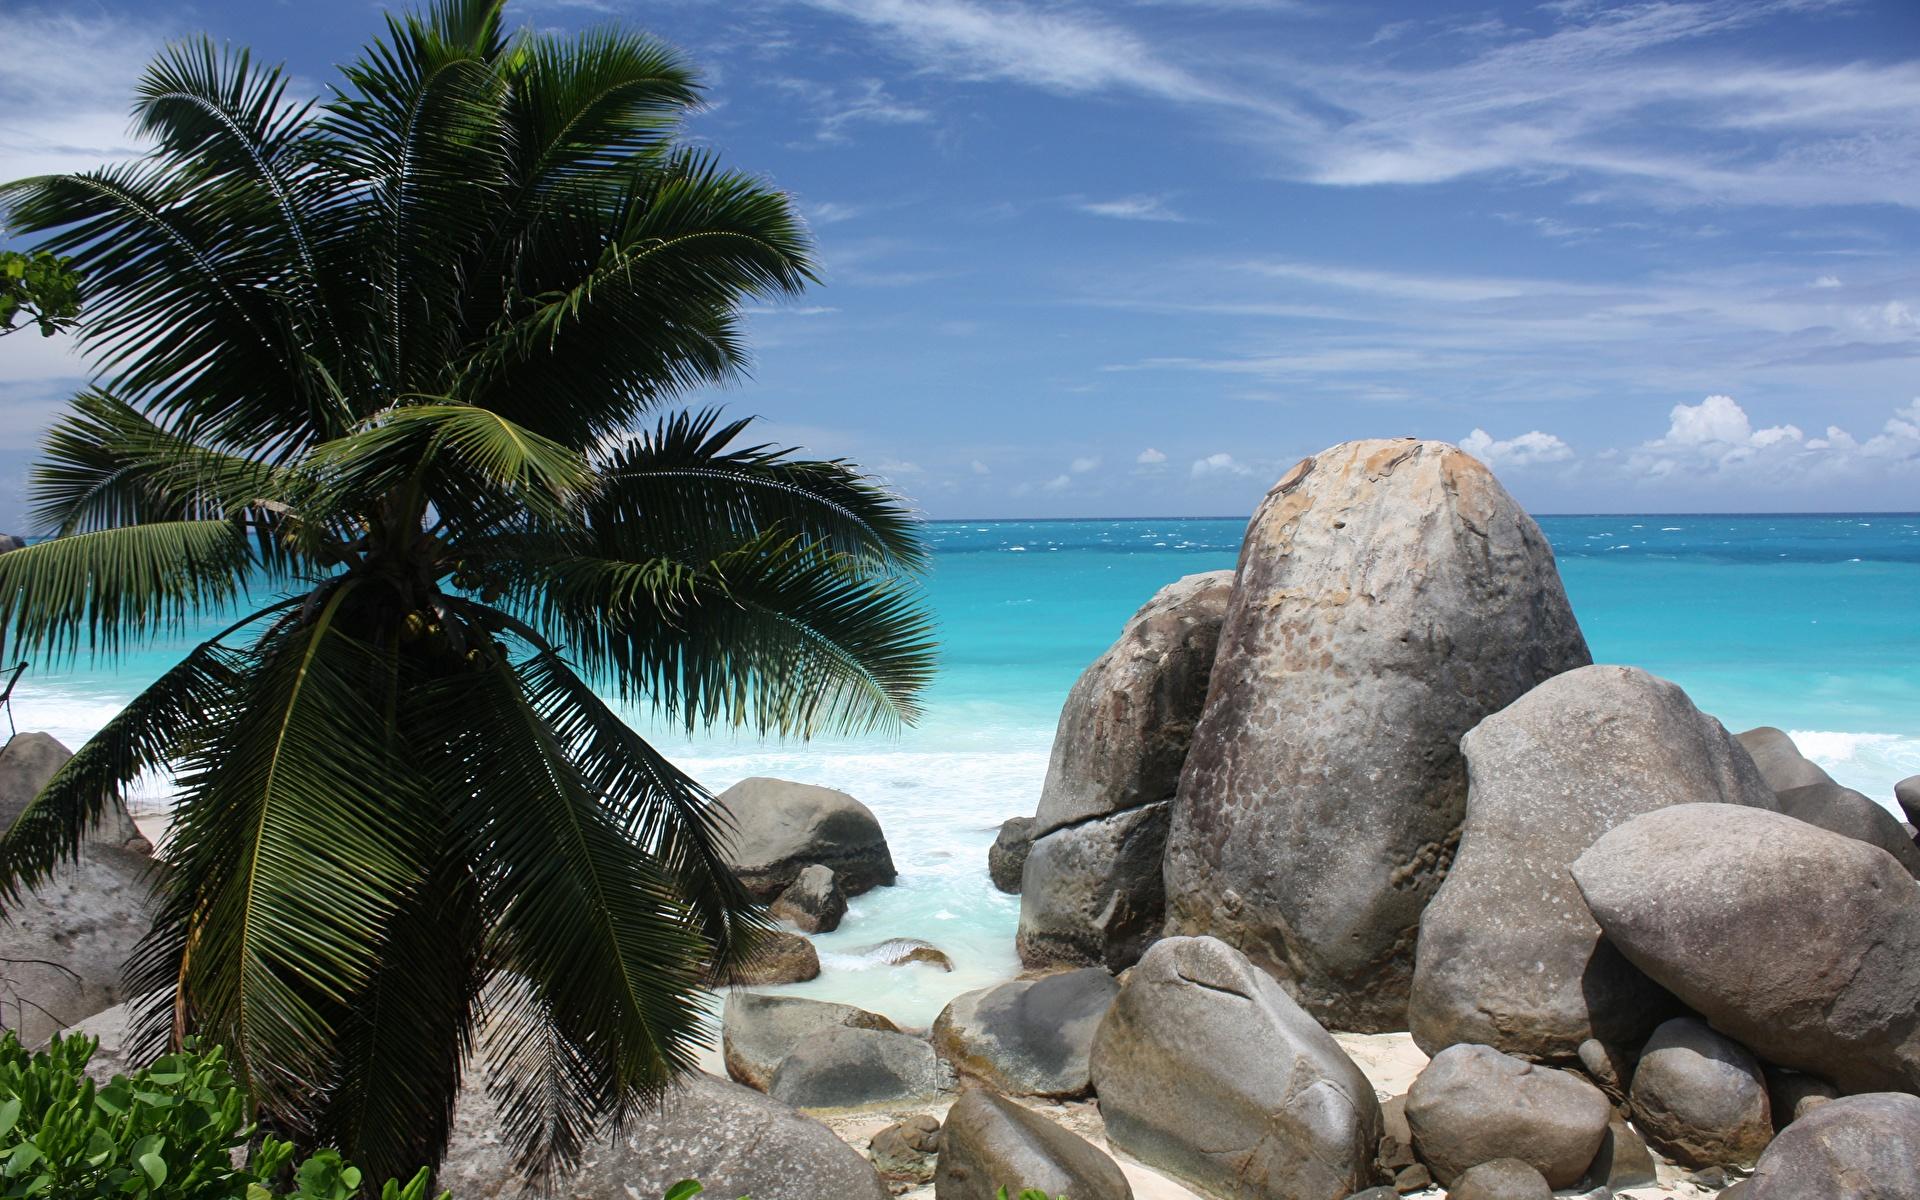 берег камни пальмы shore stones palm trees  № 792048 бесплатно